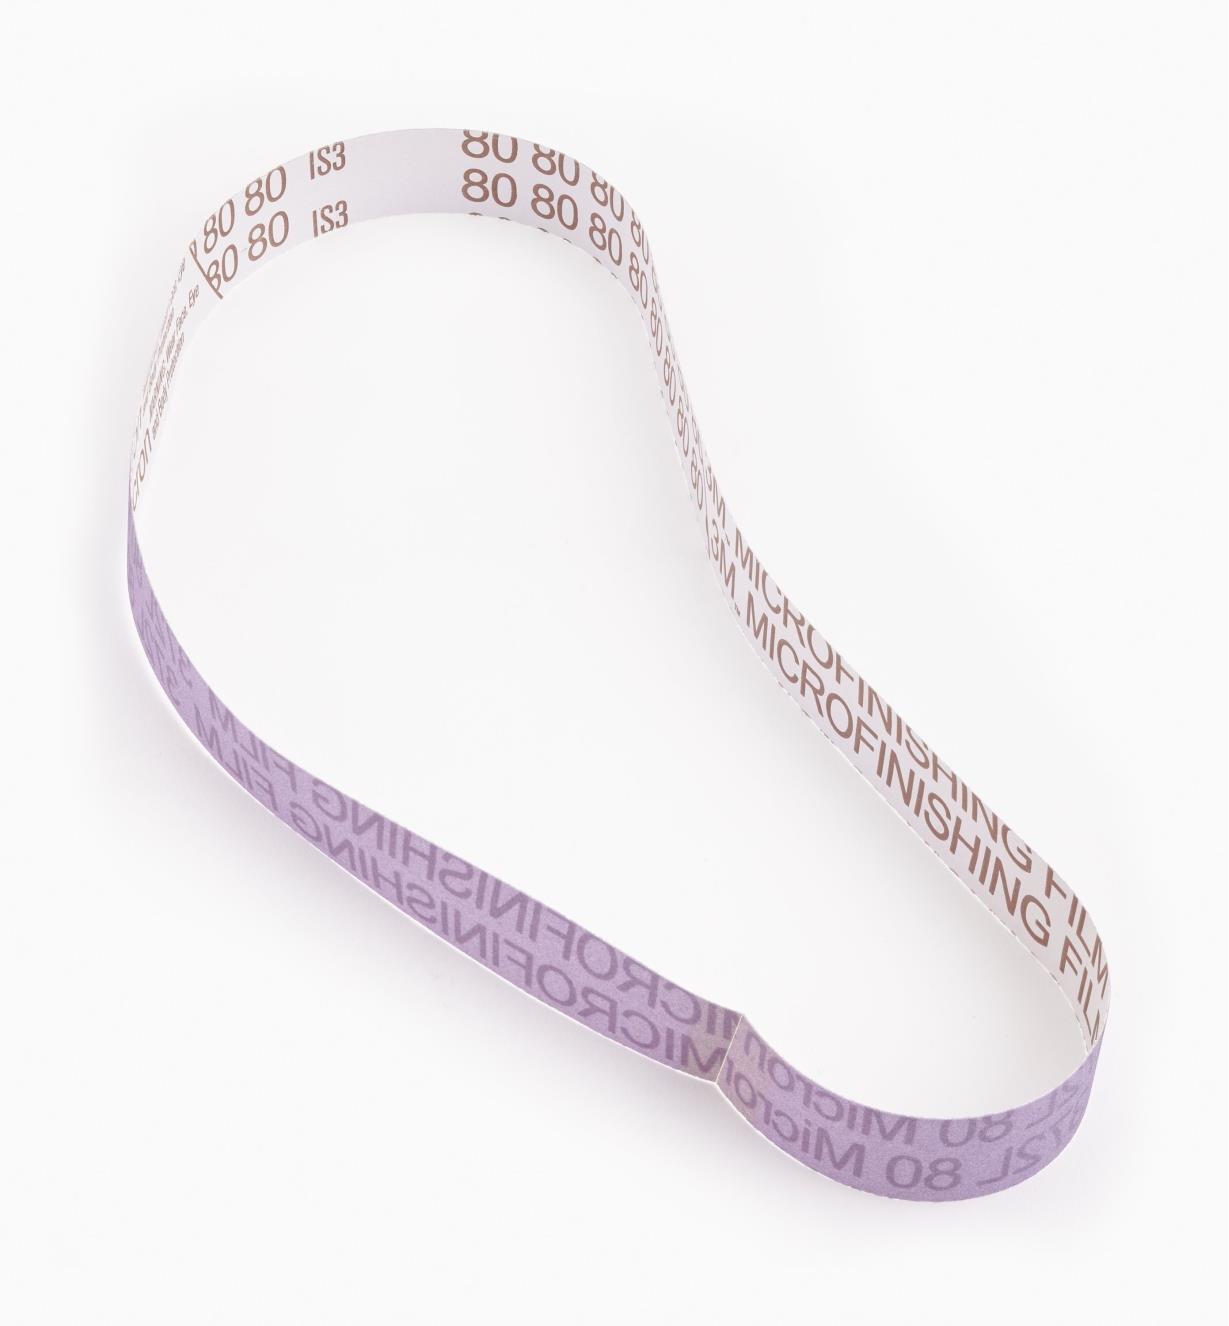 "05M3030 - 1"" x 30"" 180x Aluminum Oxide Grinding Belt"